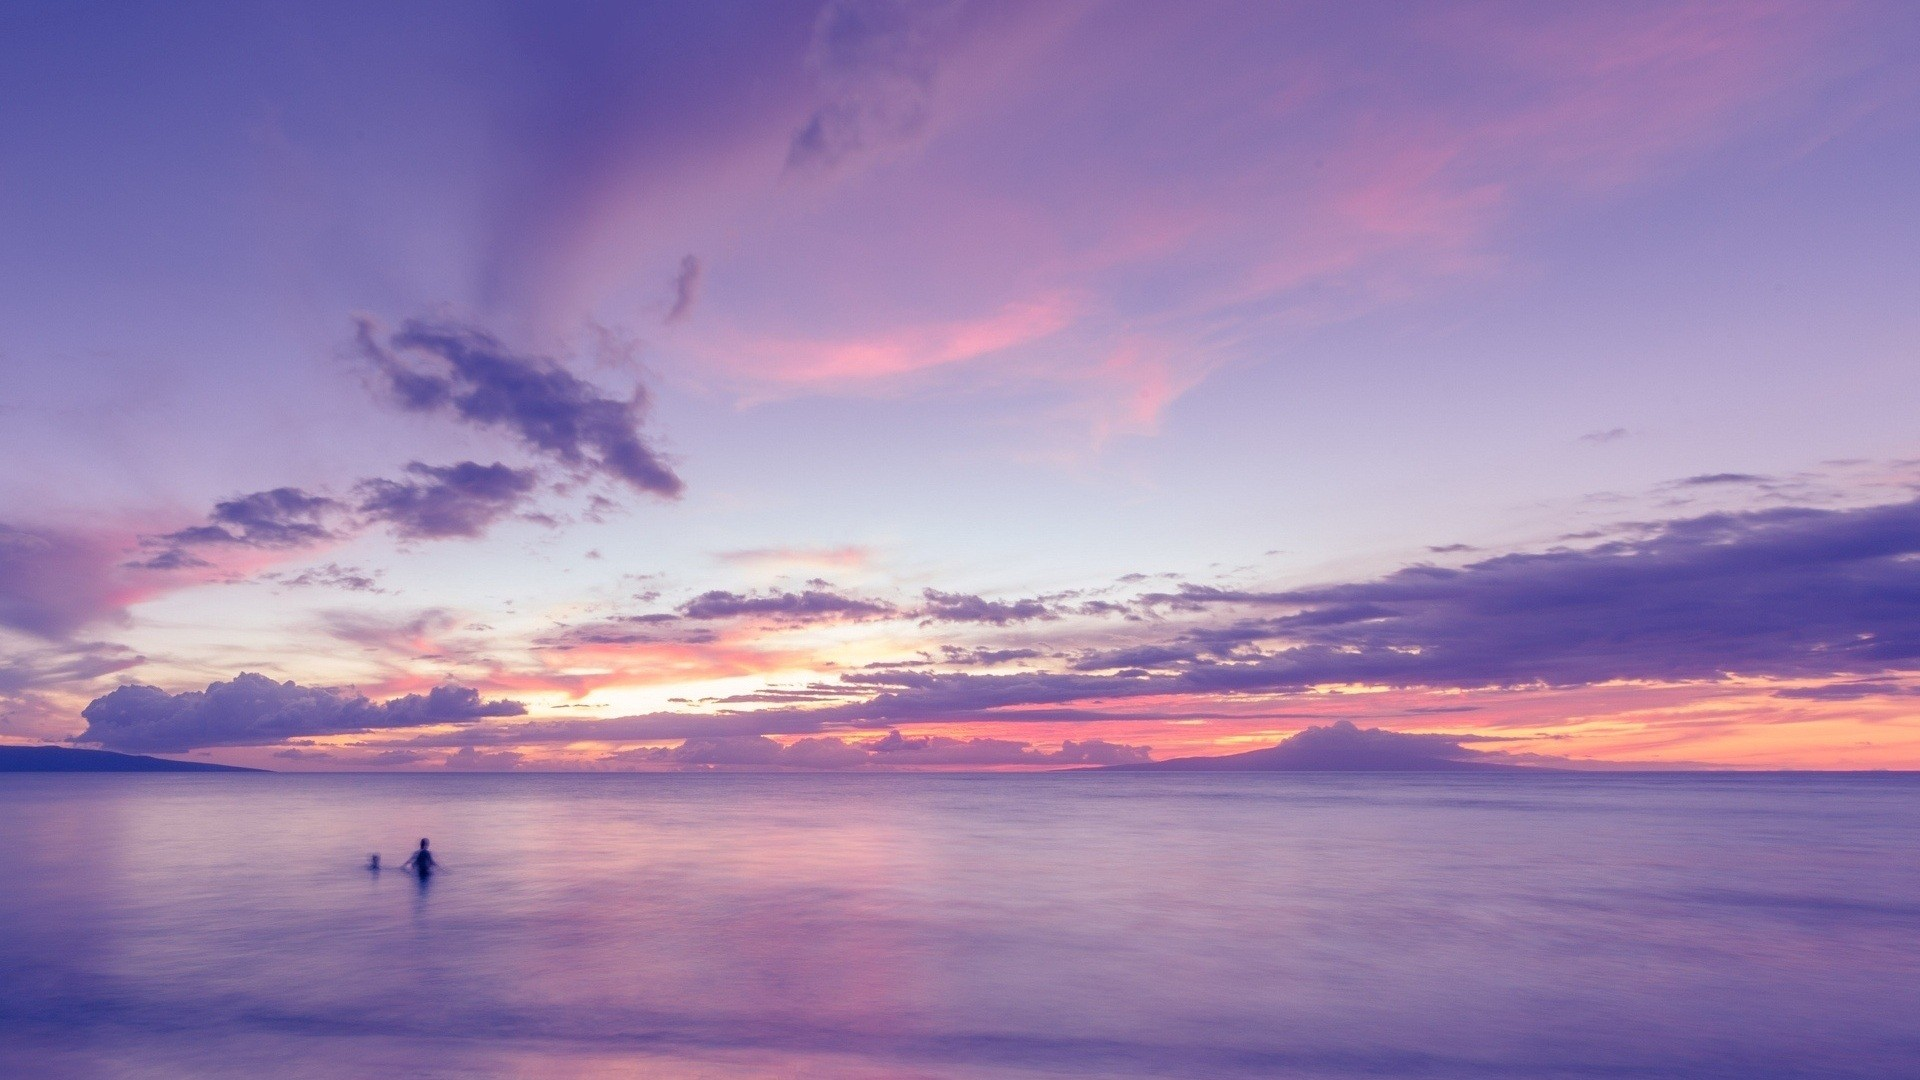 Purple Sunset Wallpaper Theme